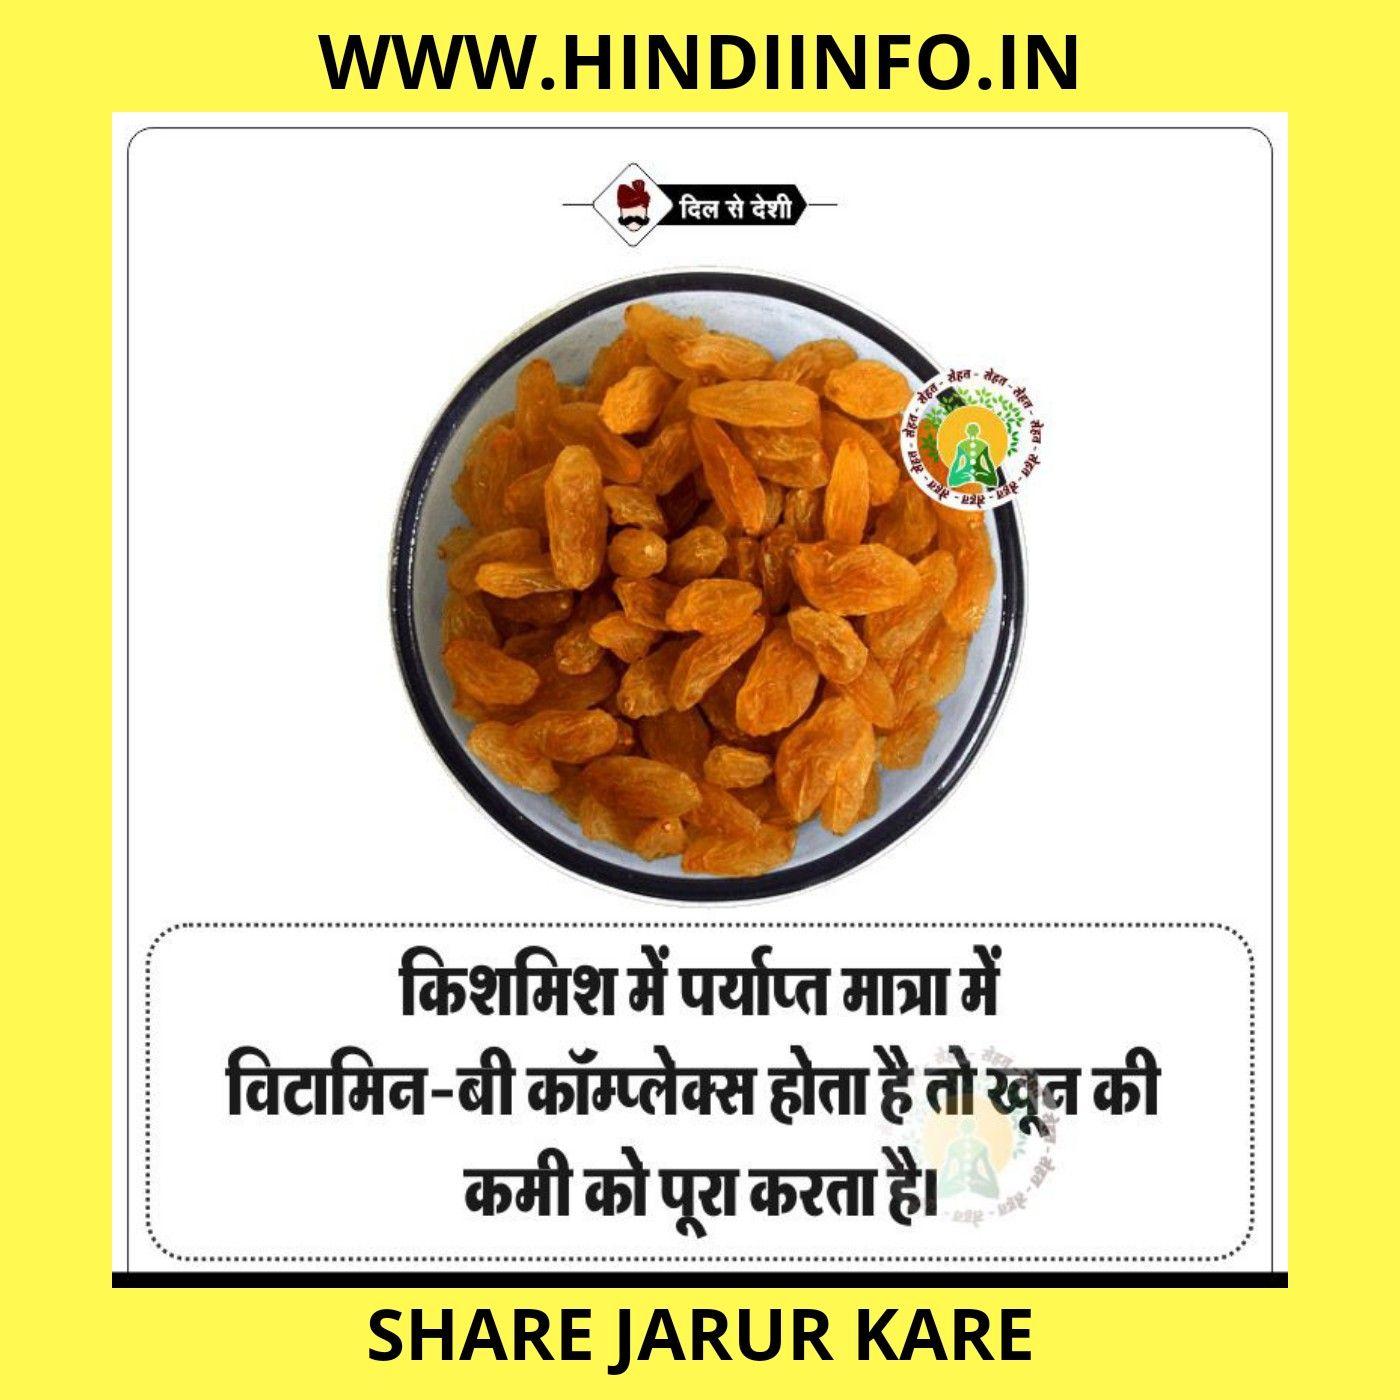 Hindi Education Website Heath Tips Health Tips Healthy Tips